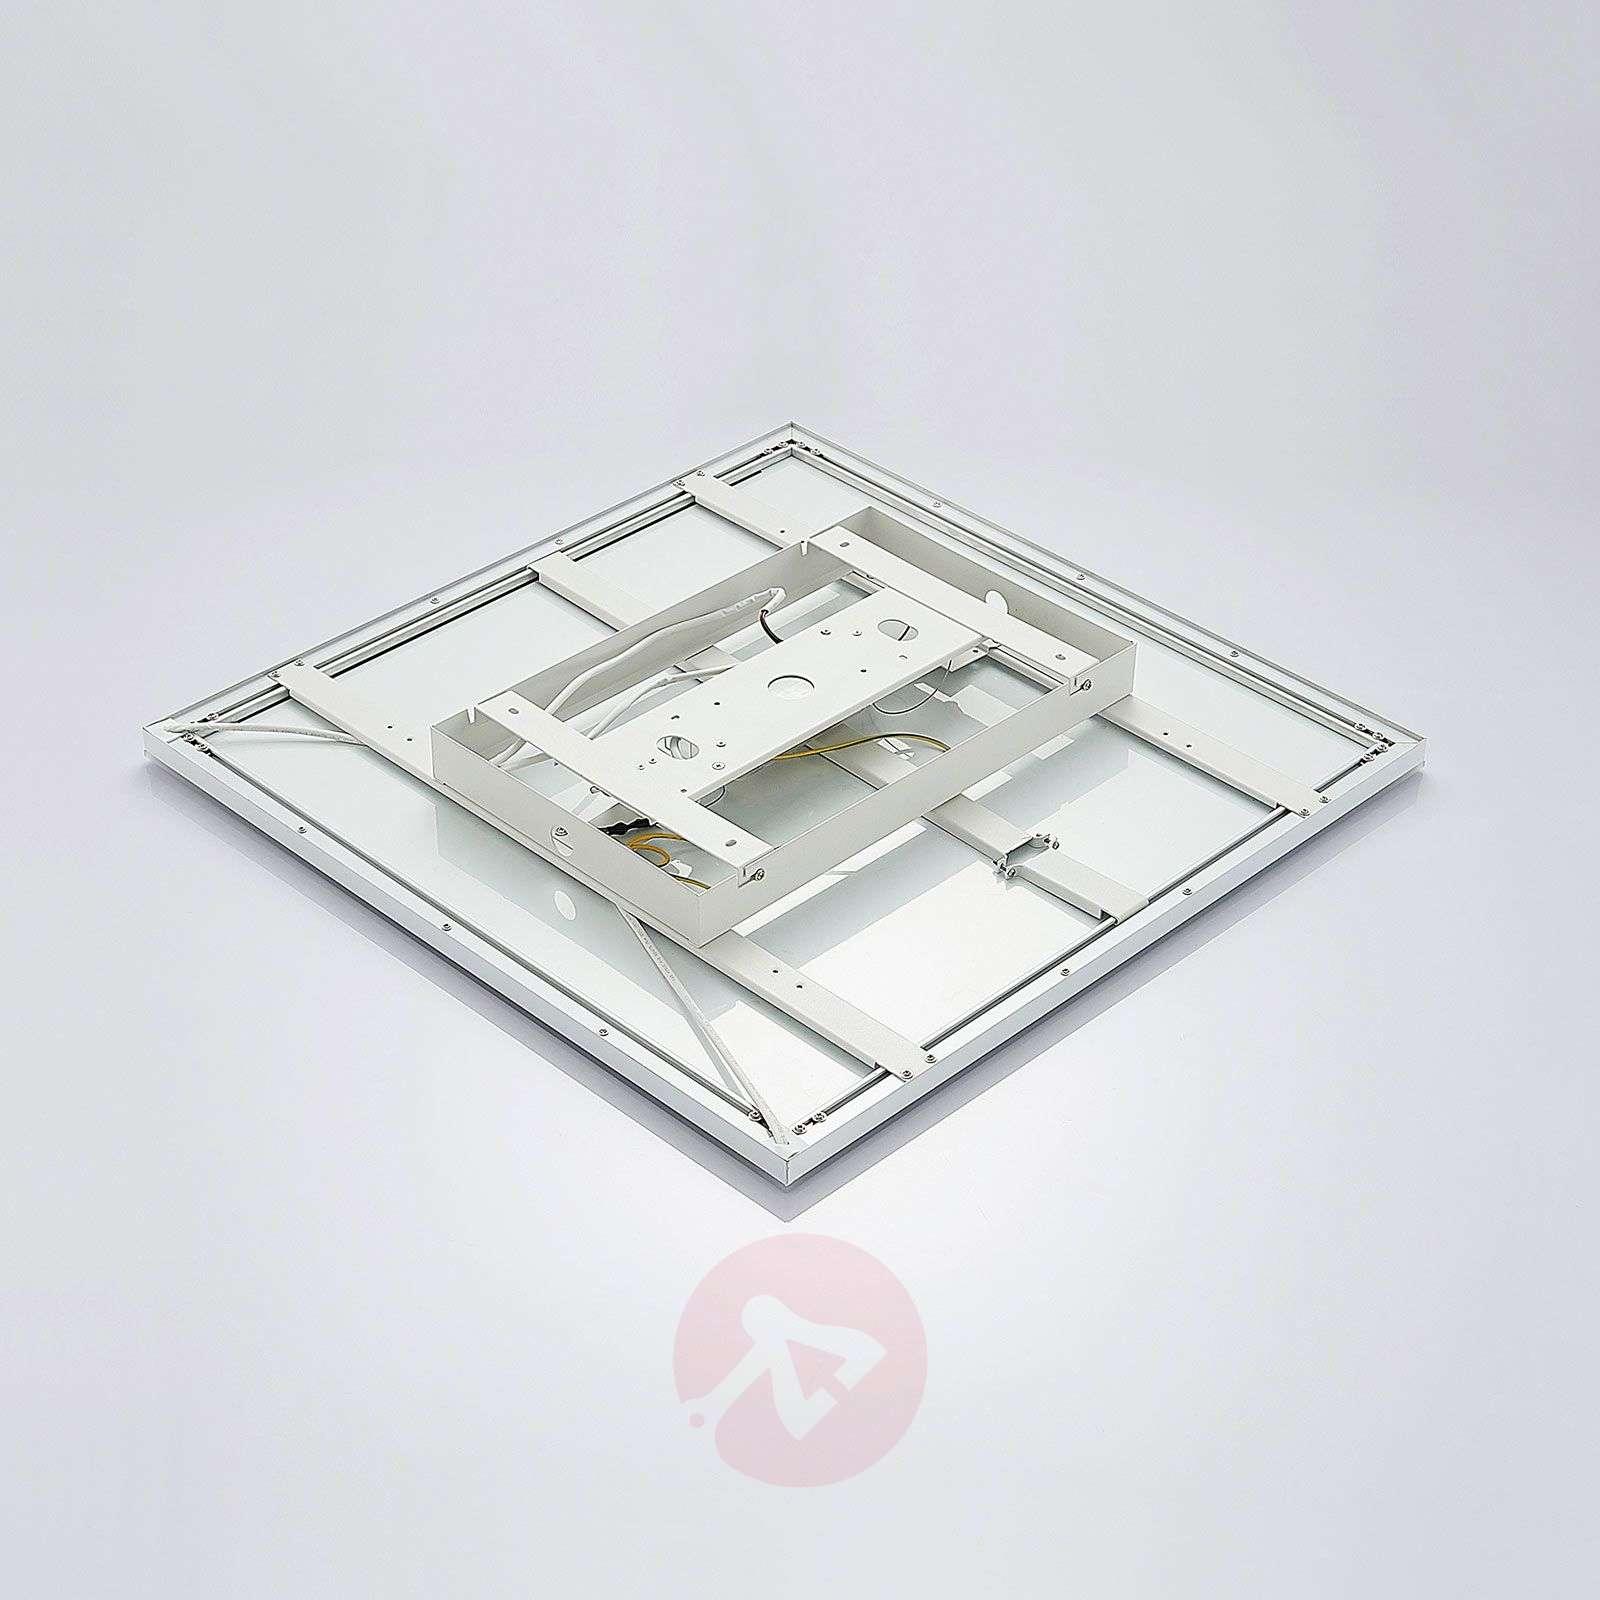 Blaan CCT LED panel with remote, 59.5 x 59.5cm-9624330-01